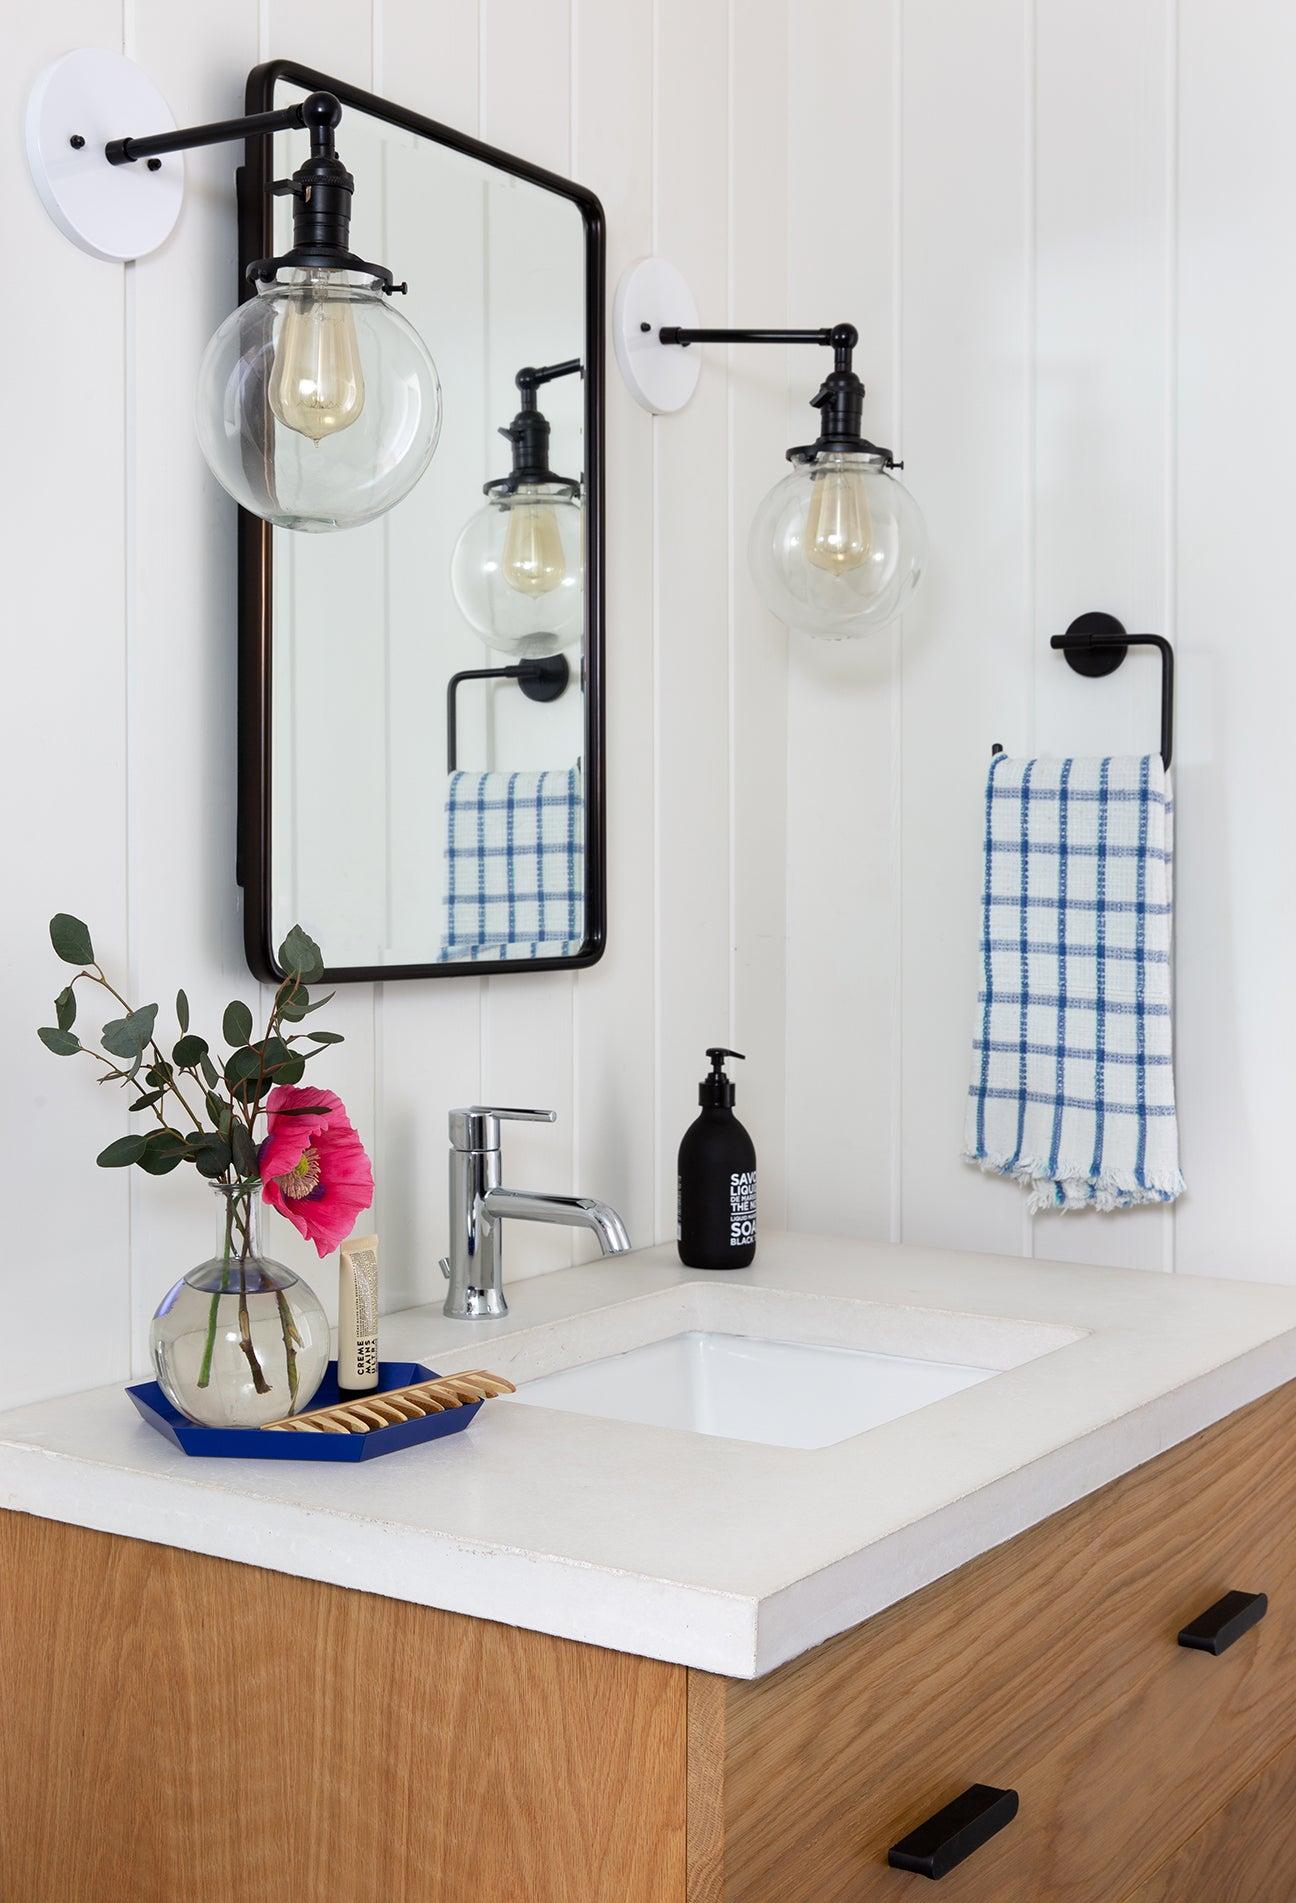 Bathroom sink with large bulb sconces.